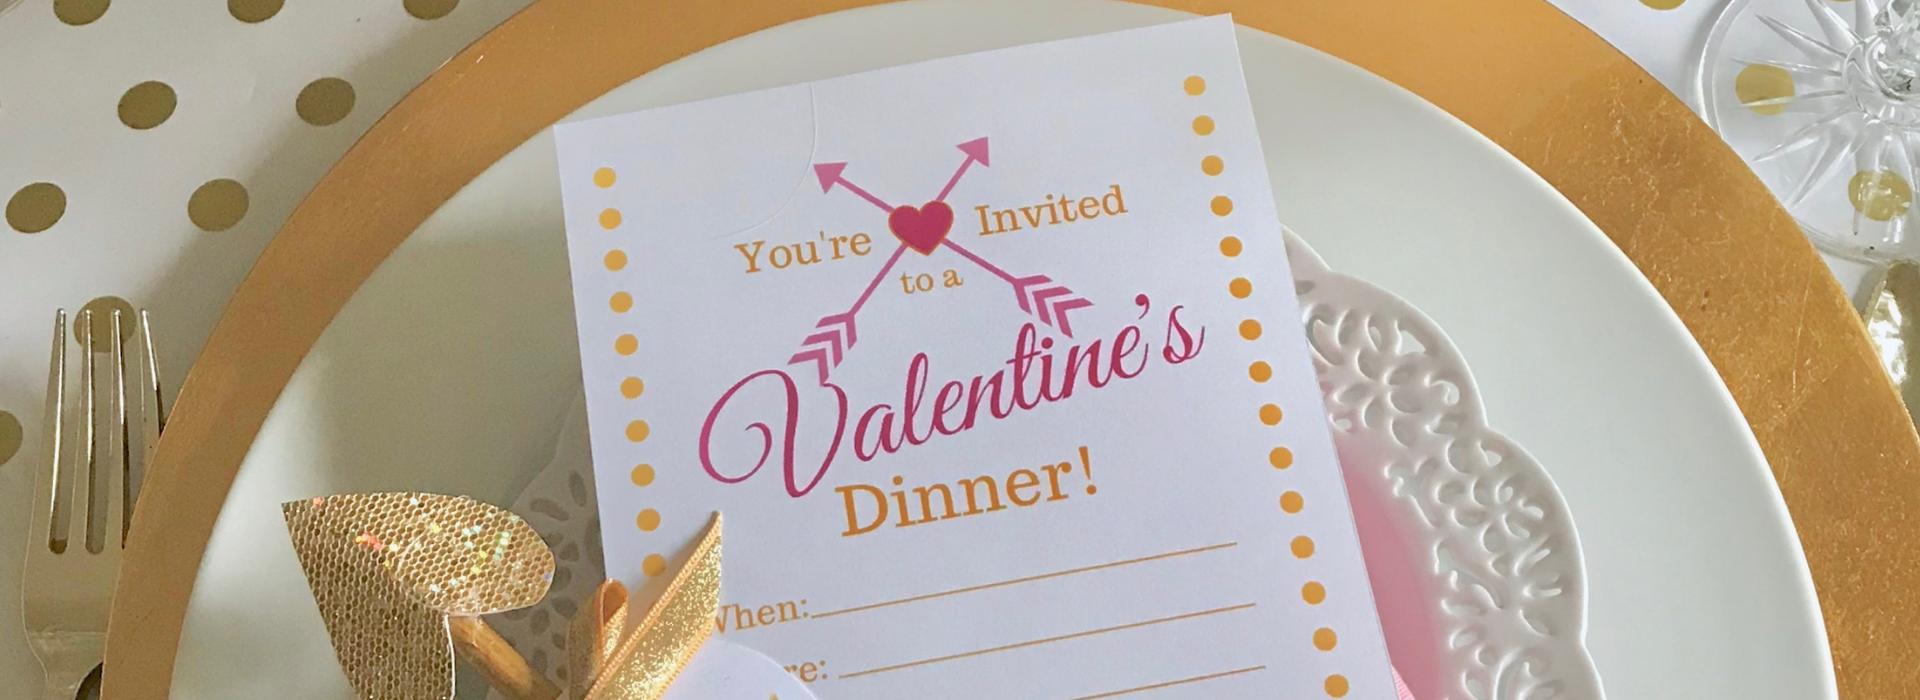 Slider- Valentines Day Dinner-lizbushong.com